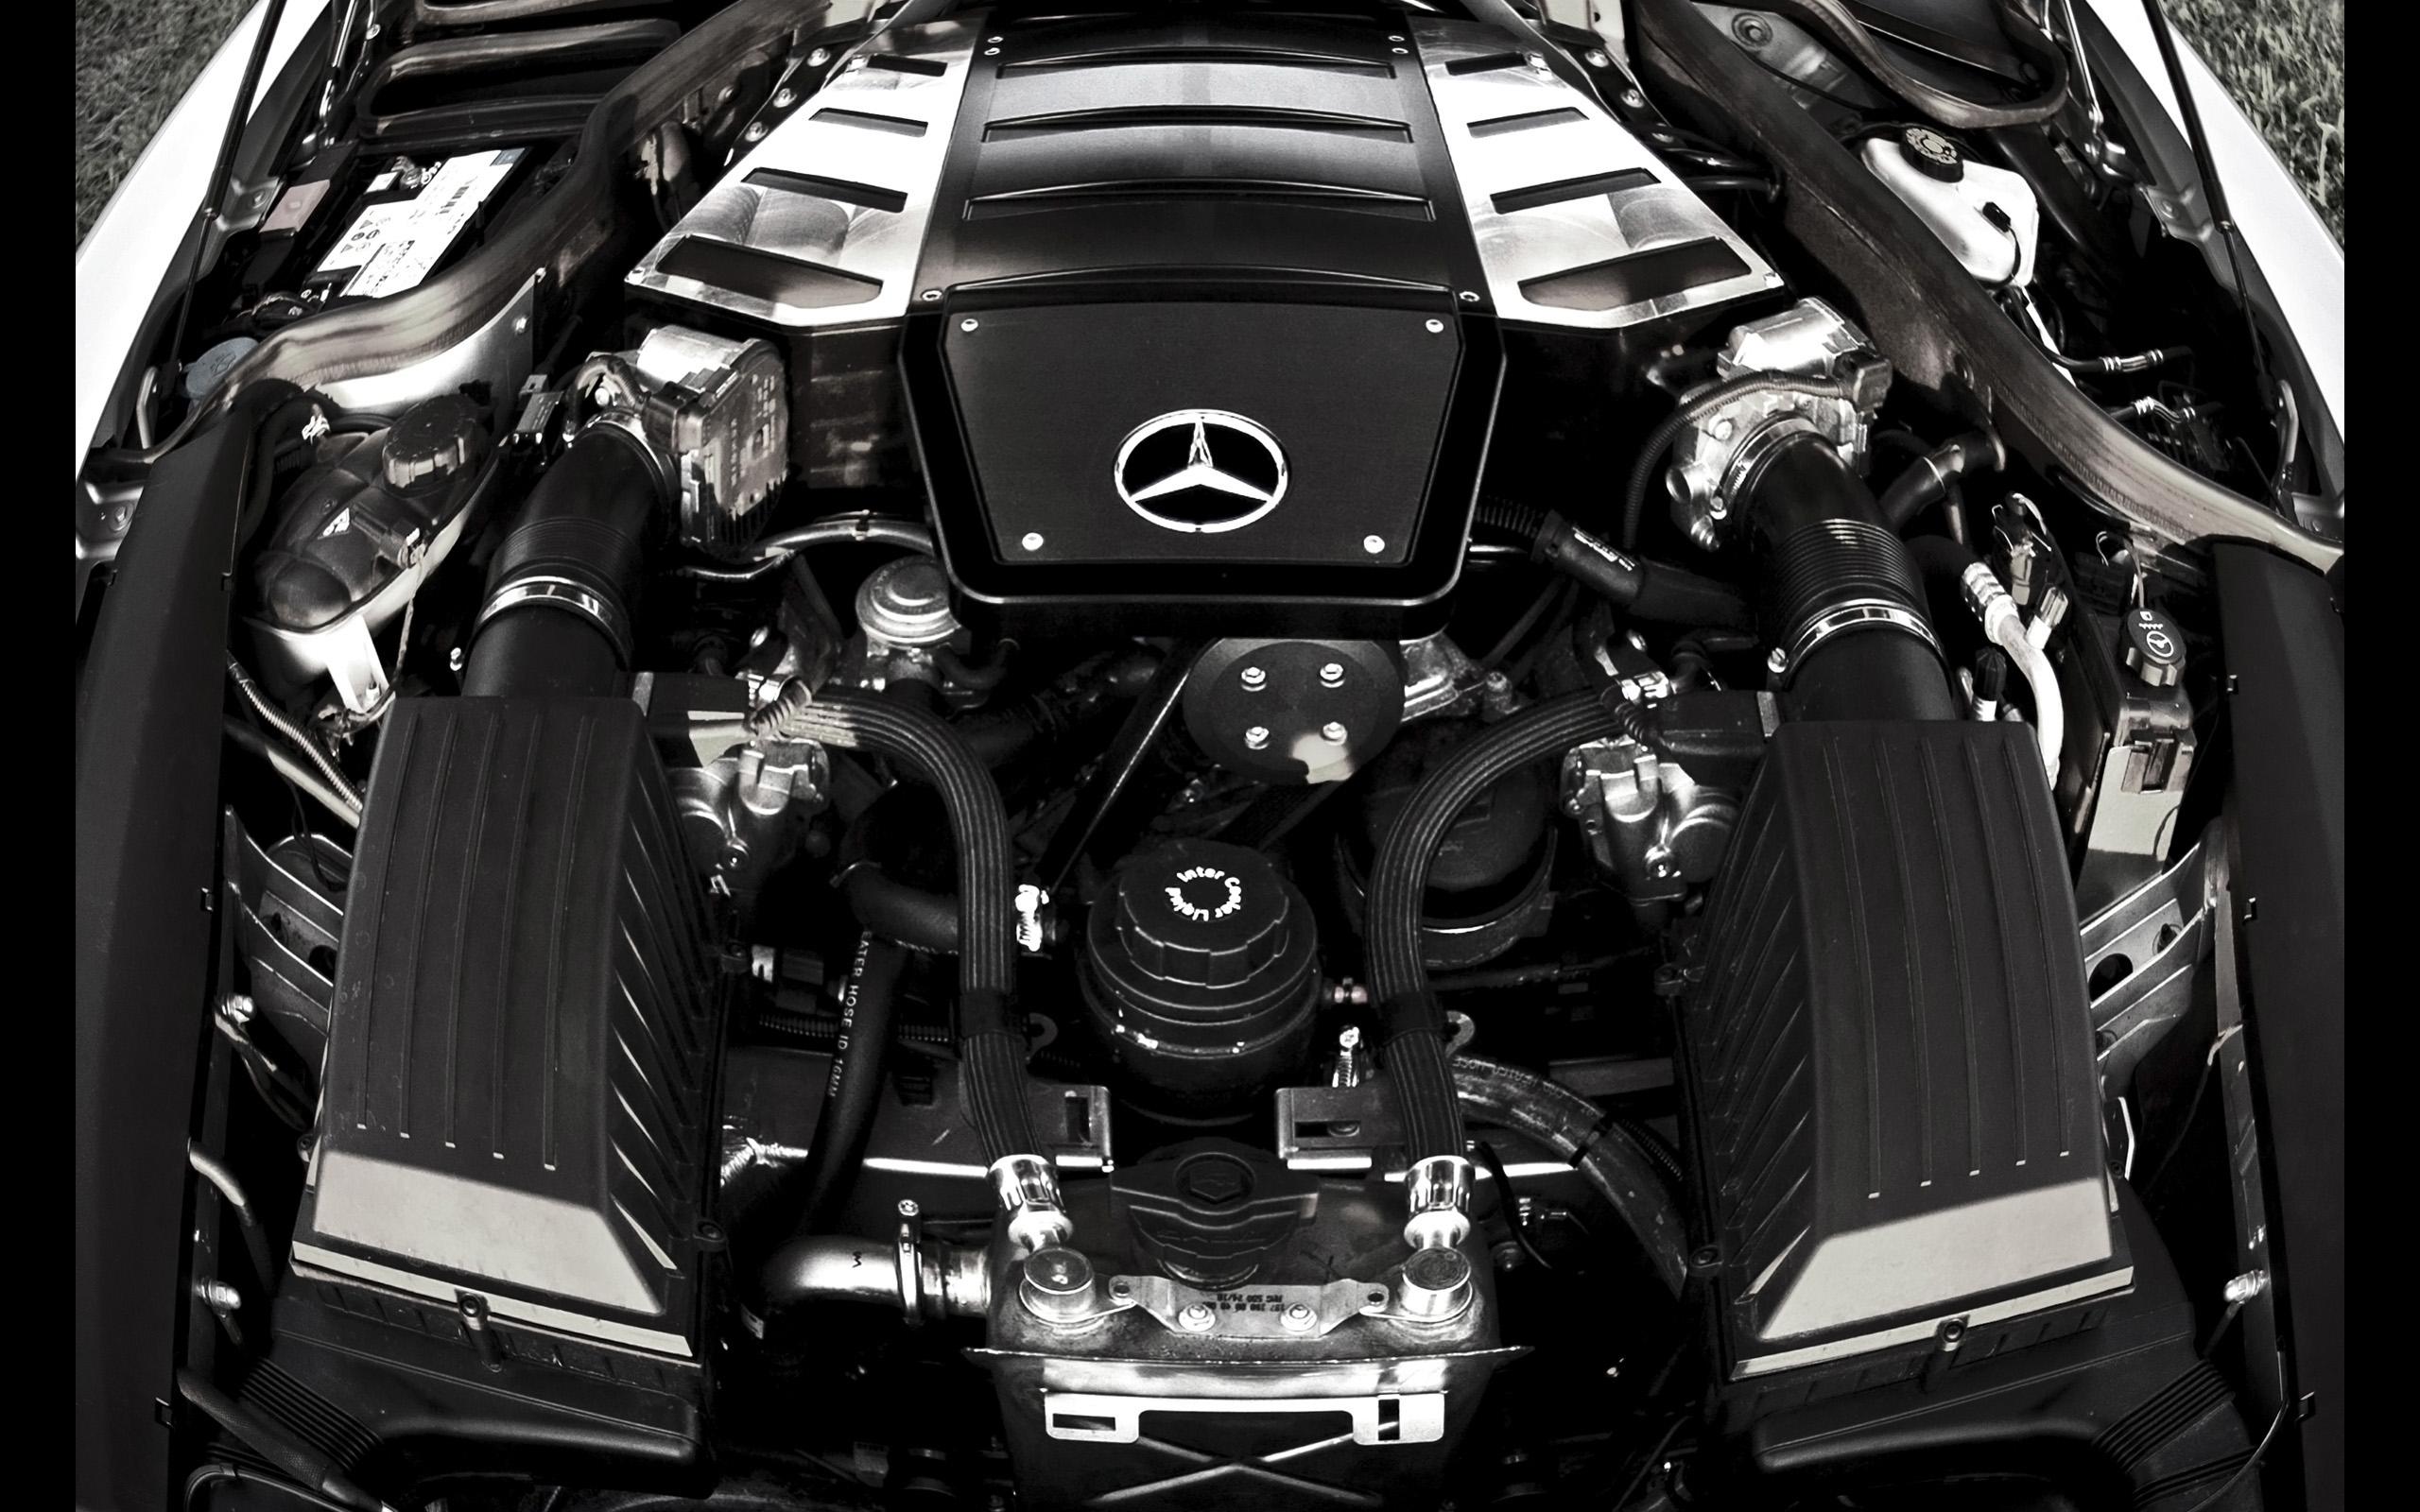 2013 Wheelsandmore Mercedes Benz SLS AMG Roadster Supercar Tuning  Convertible Engine F Wallpaper | 2560x1600 | 159251 | WallpaperUP